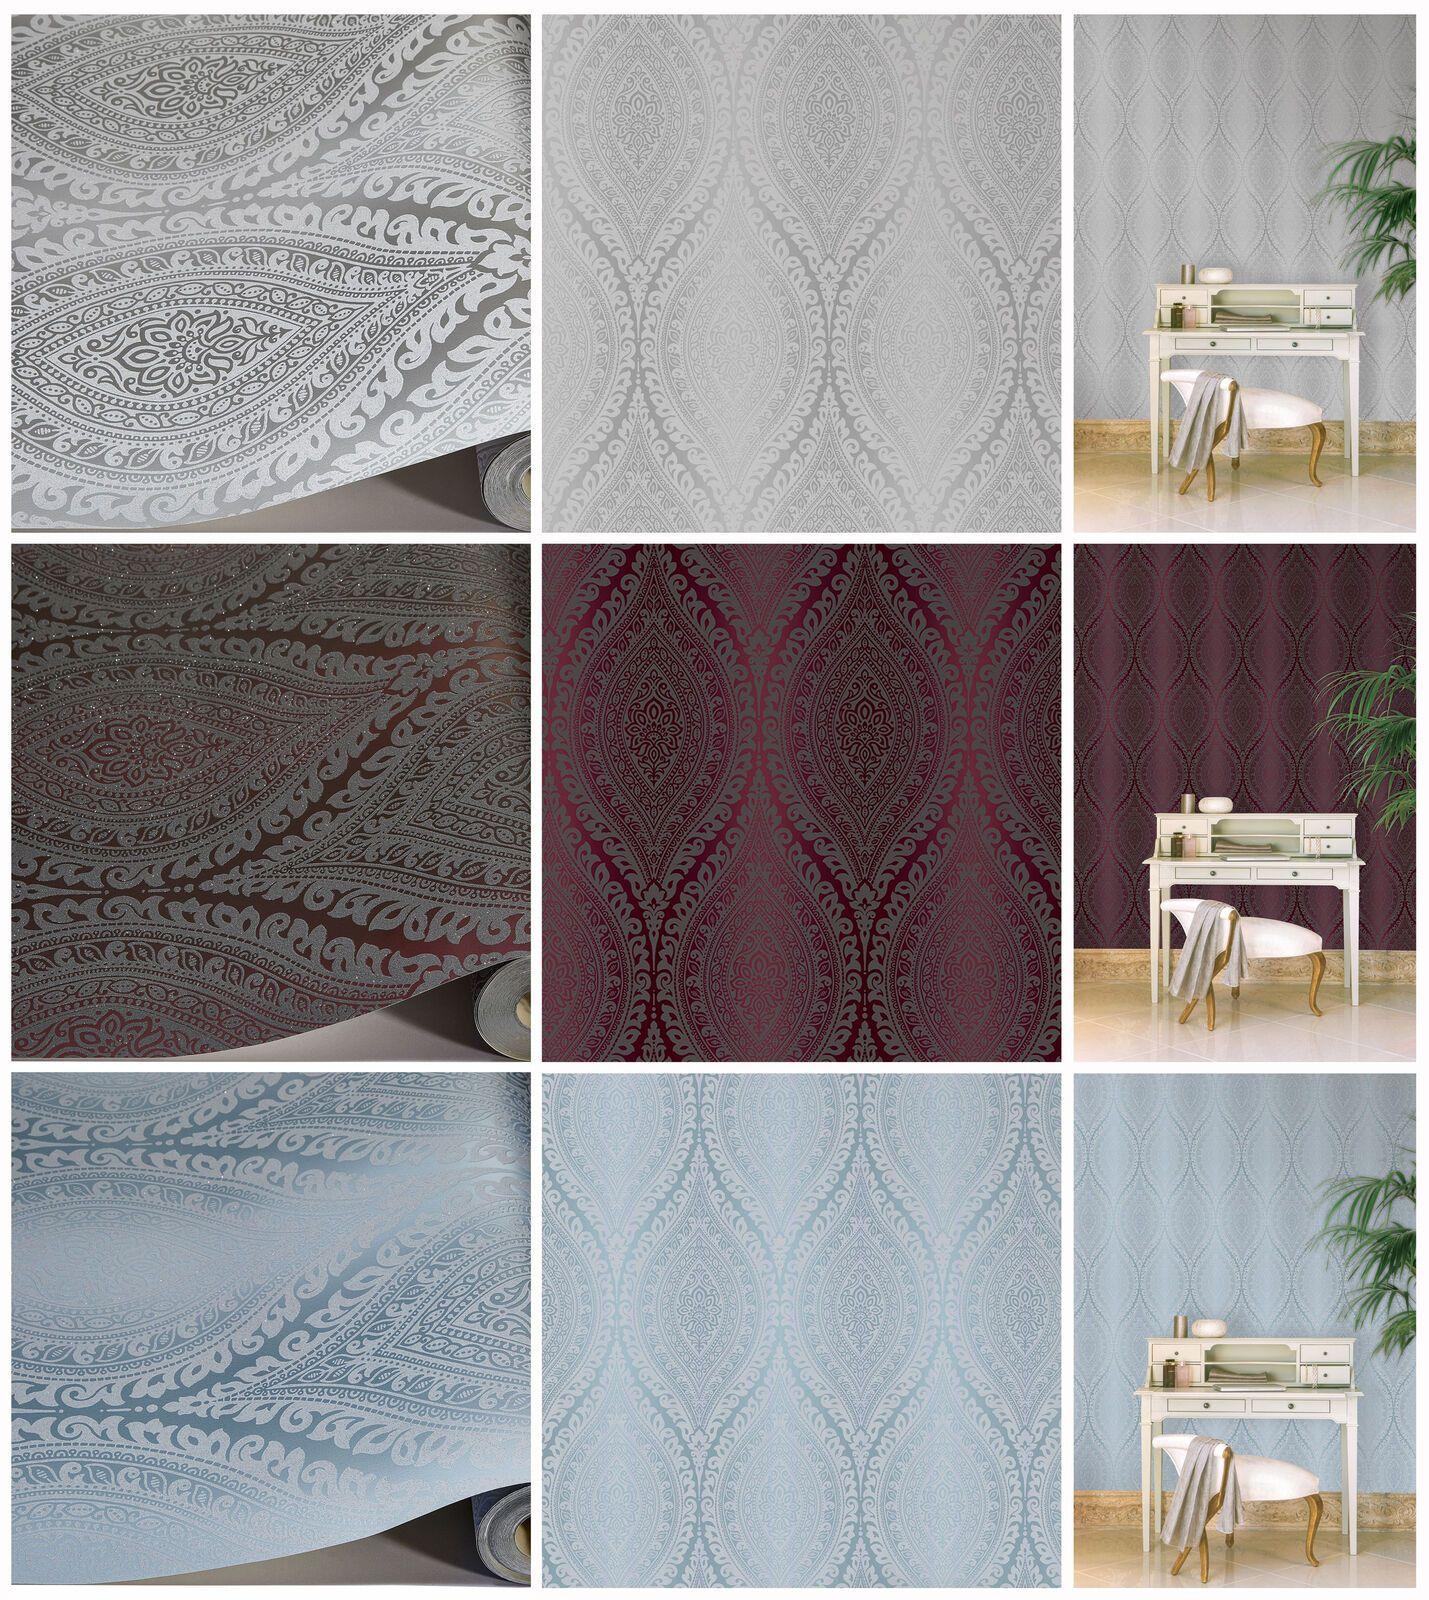 Damask Wallpaper Metallic Glitter Sparkle Textured Embossed Luxury Vinyl  | eBay